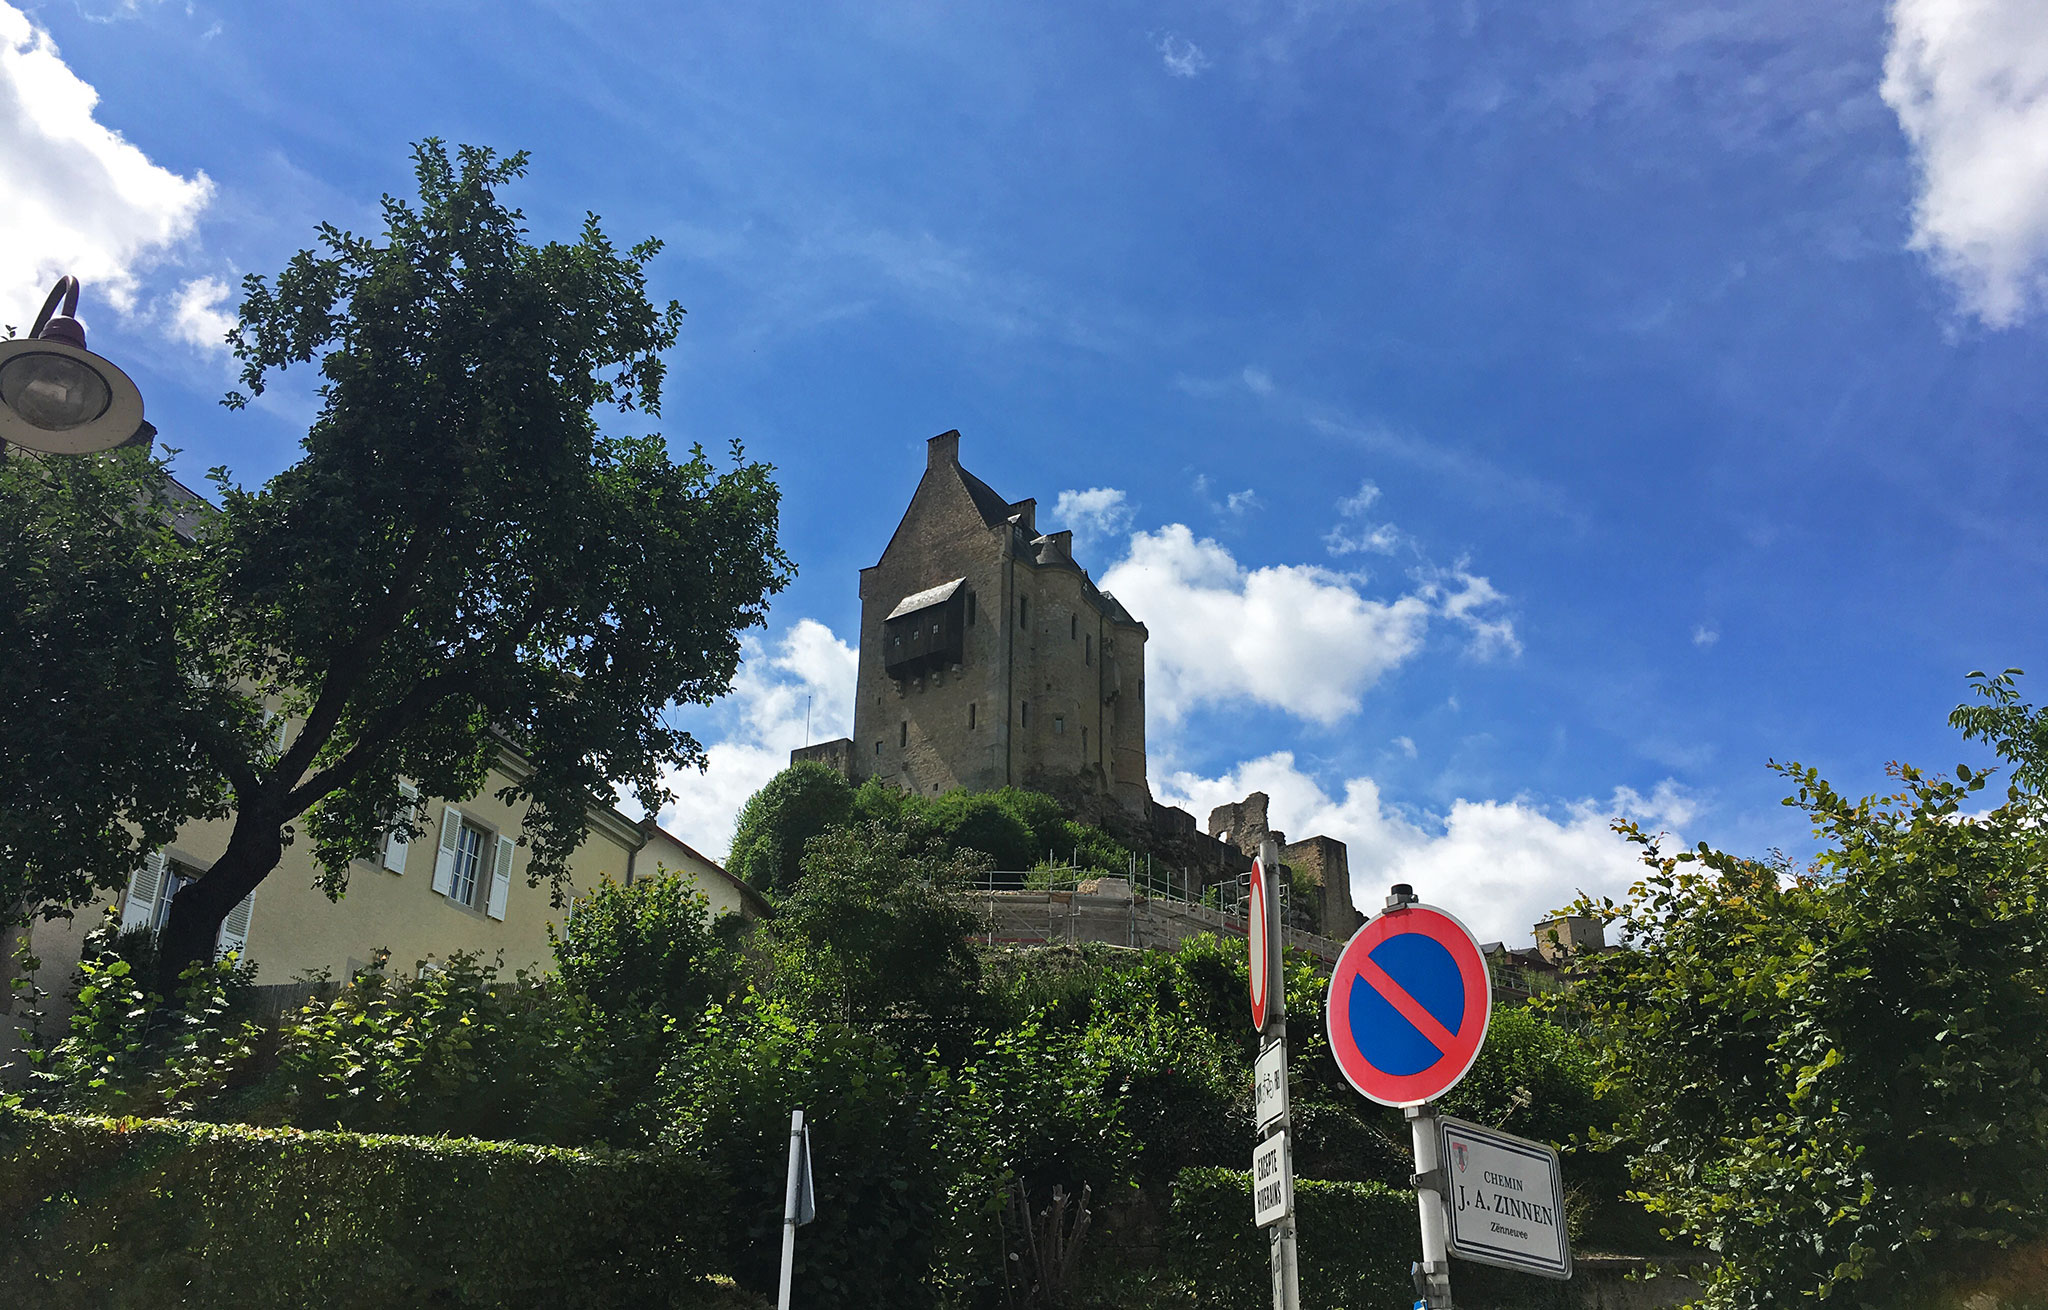 Larochette, a small town in Luxembourg here represented by the Larochette Castle